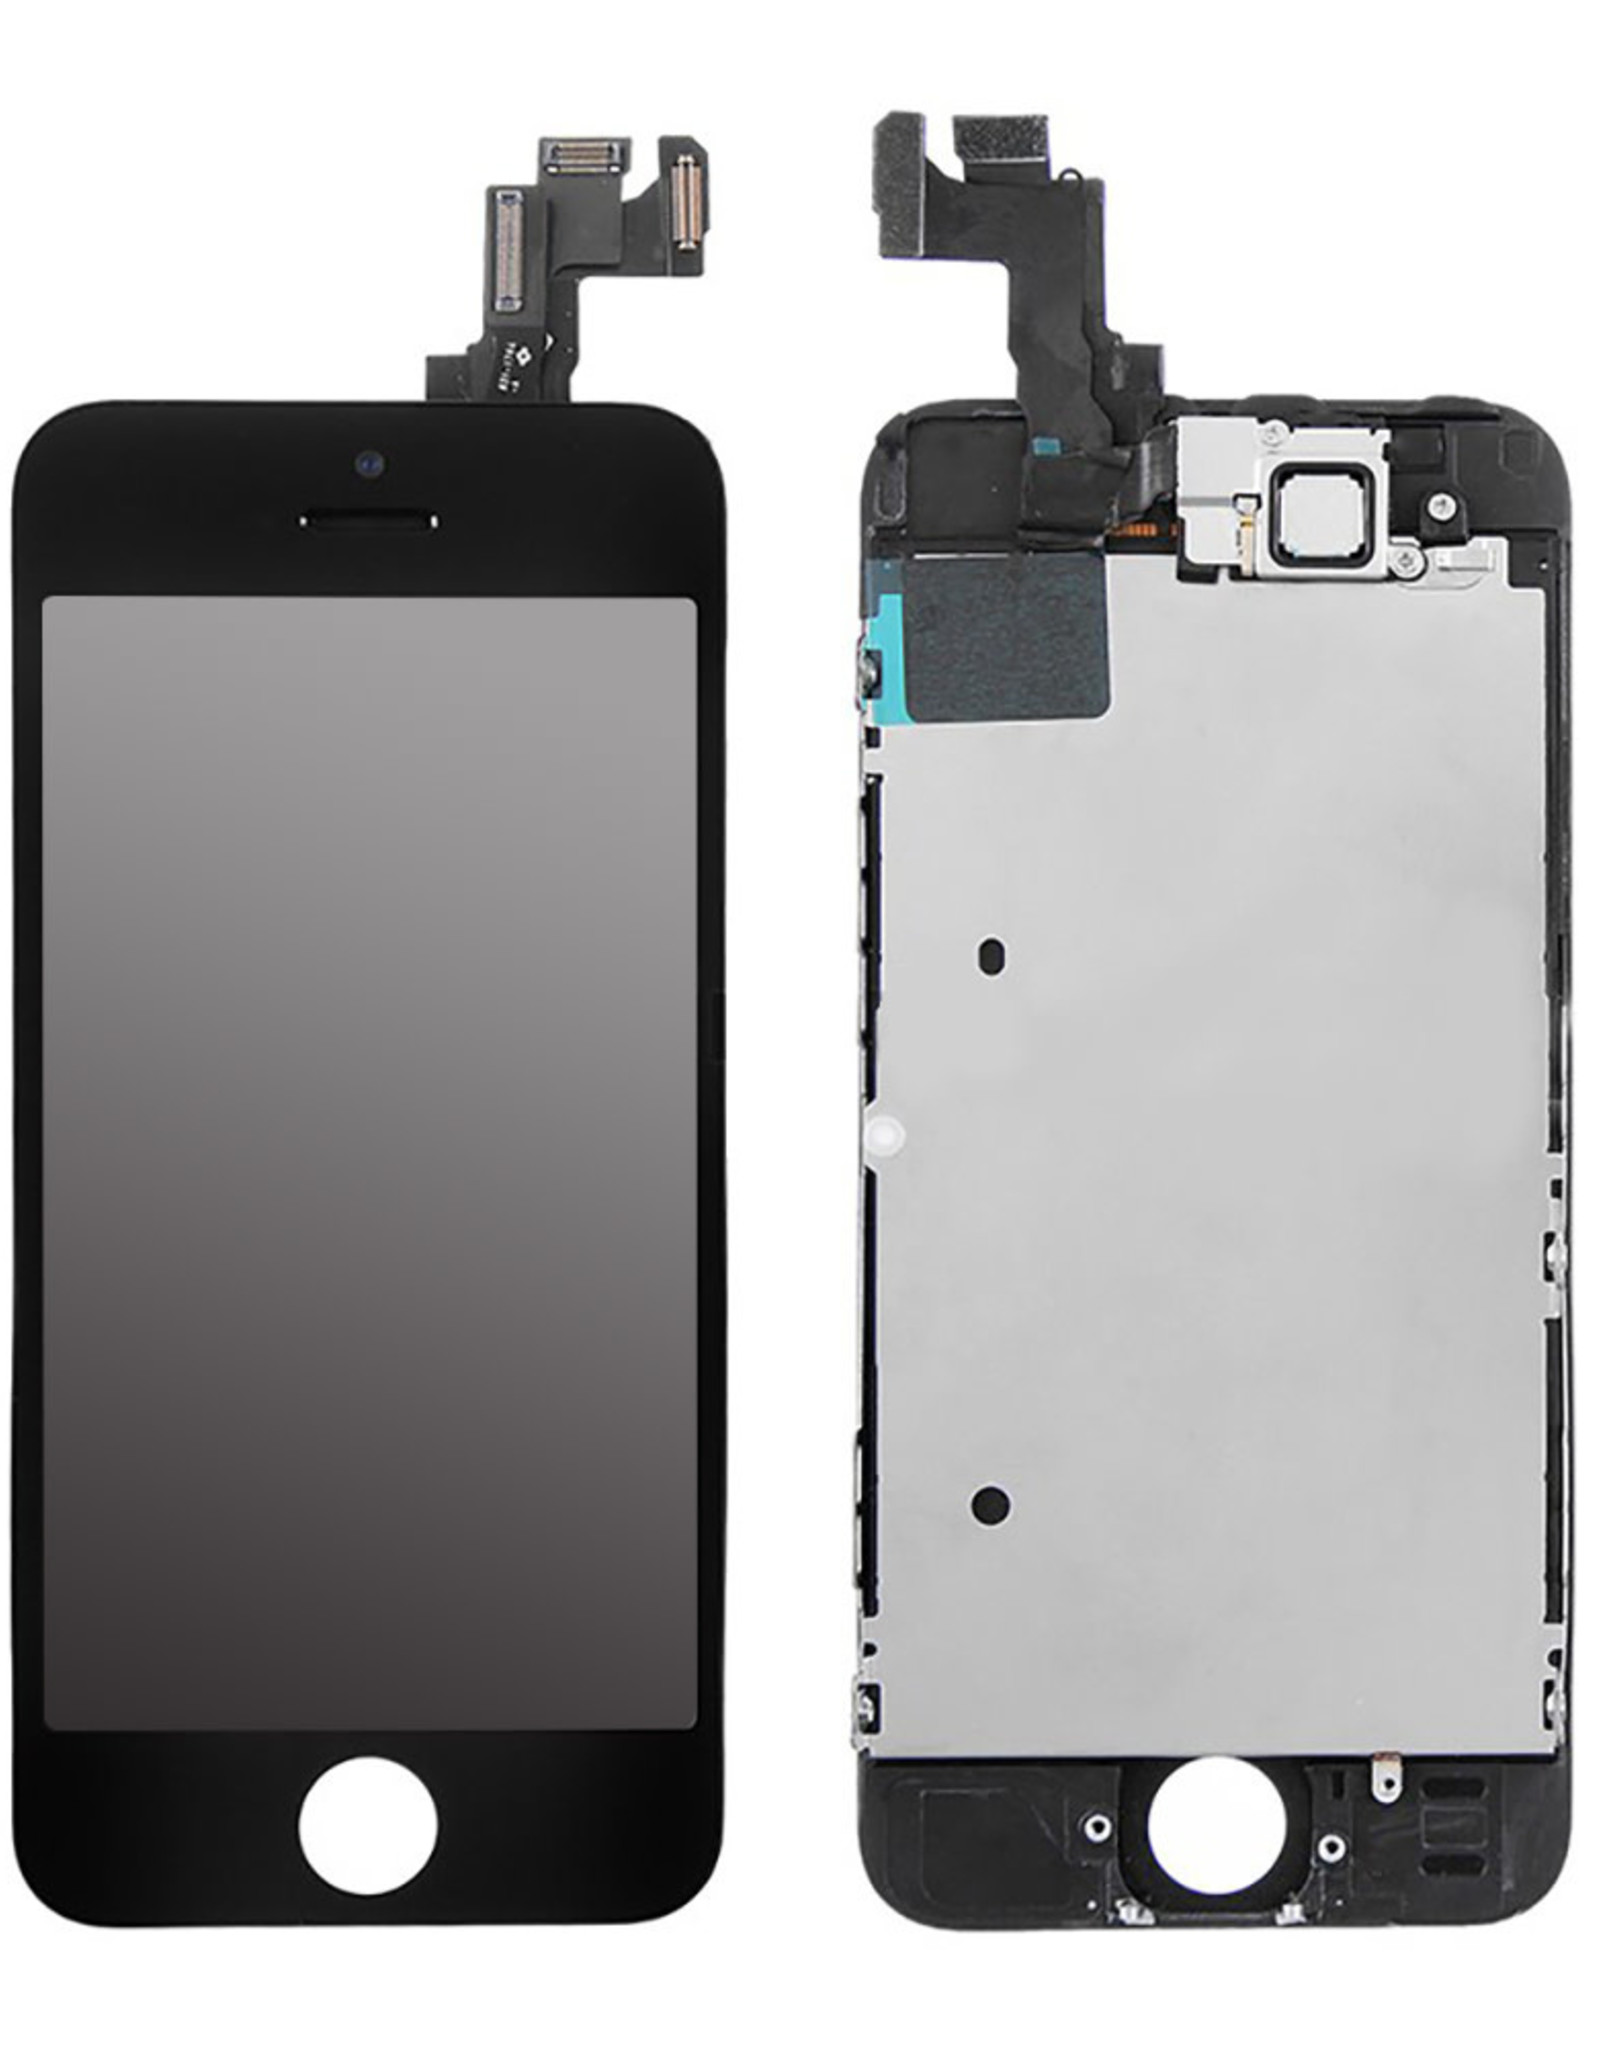 Apple iPhone 5 (Black) Screen Replacement OEM (LCD)